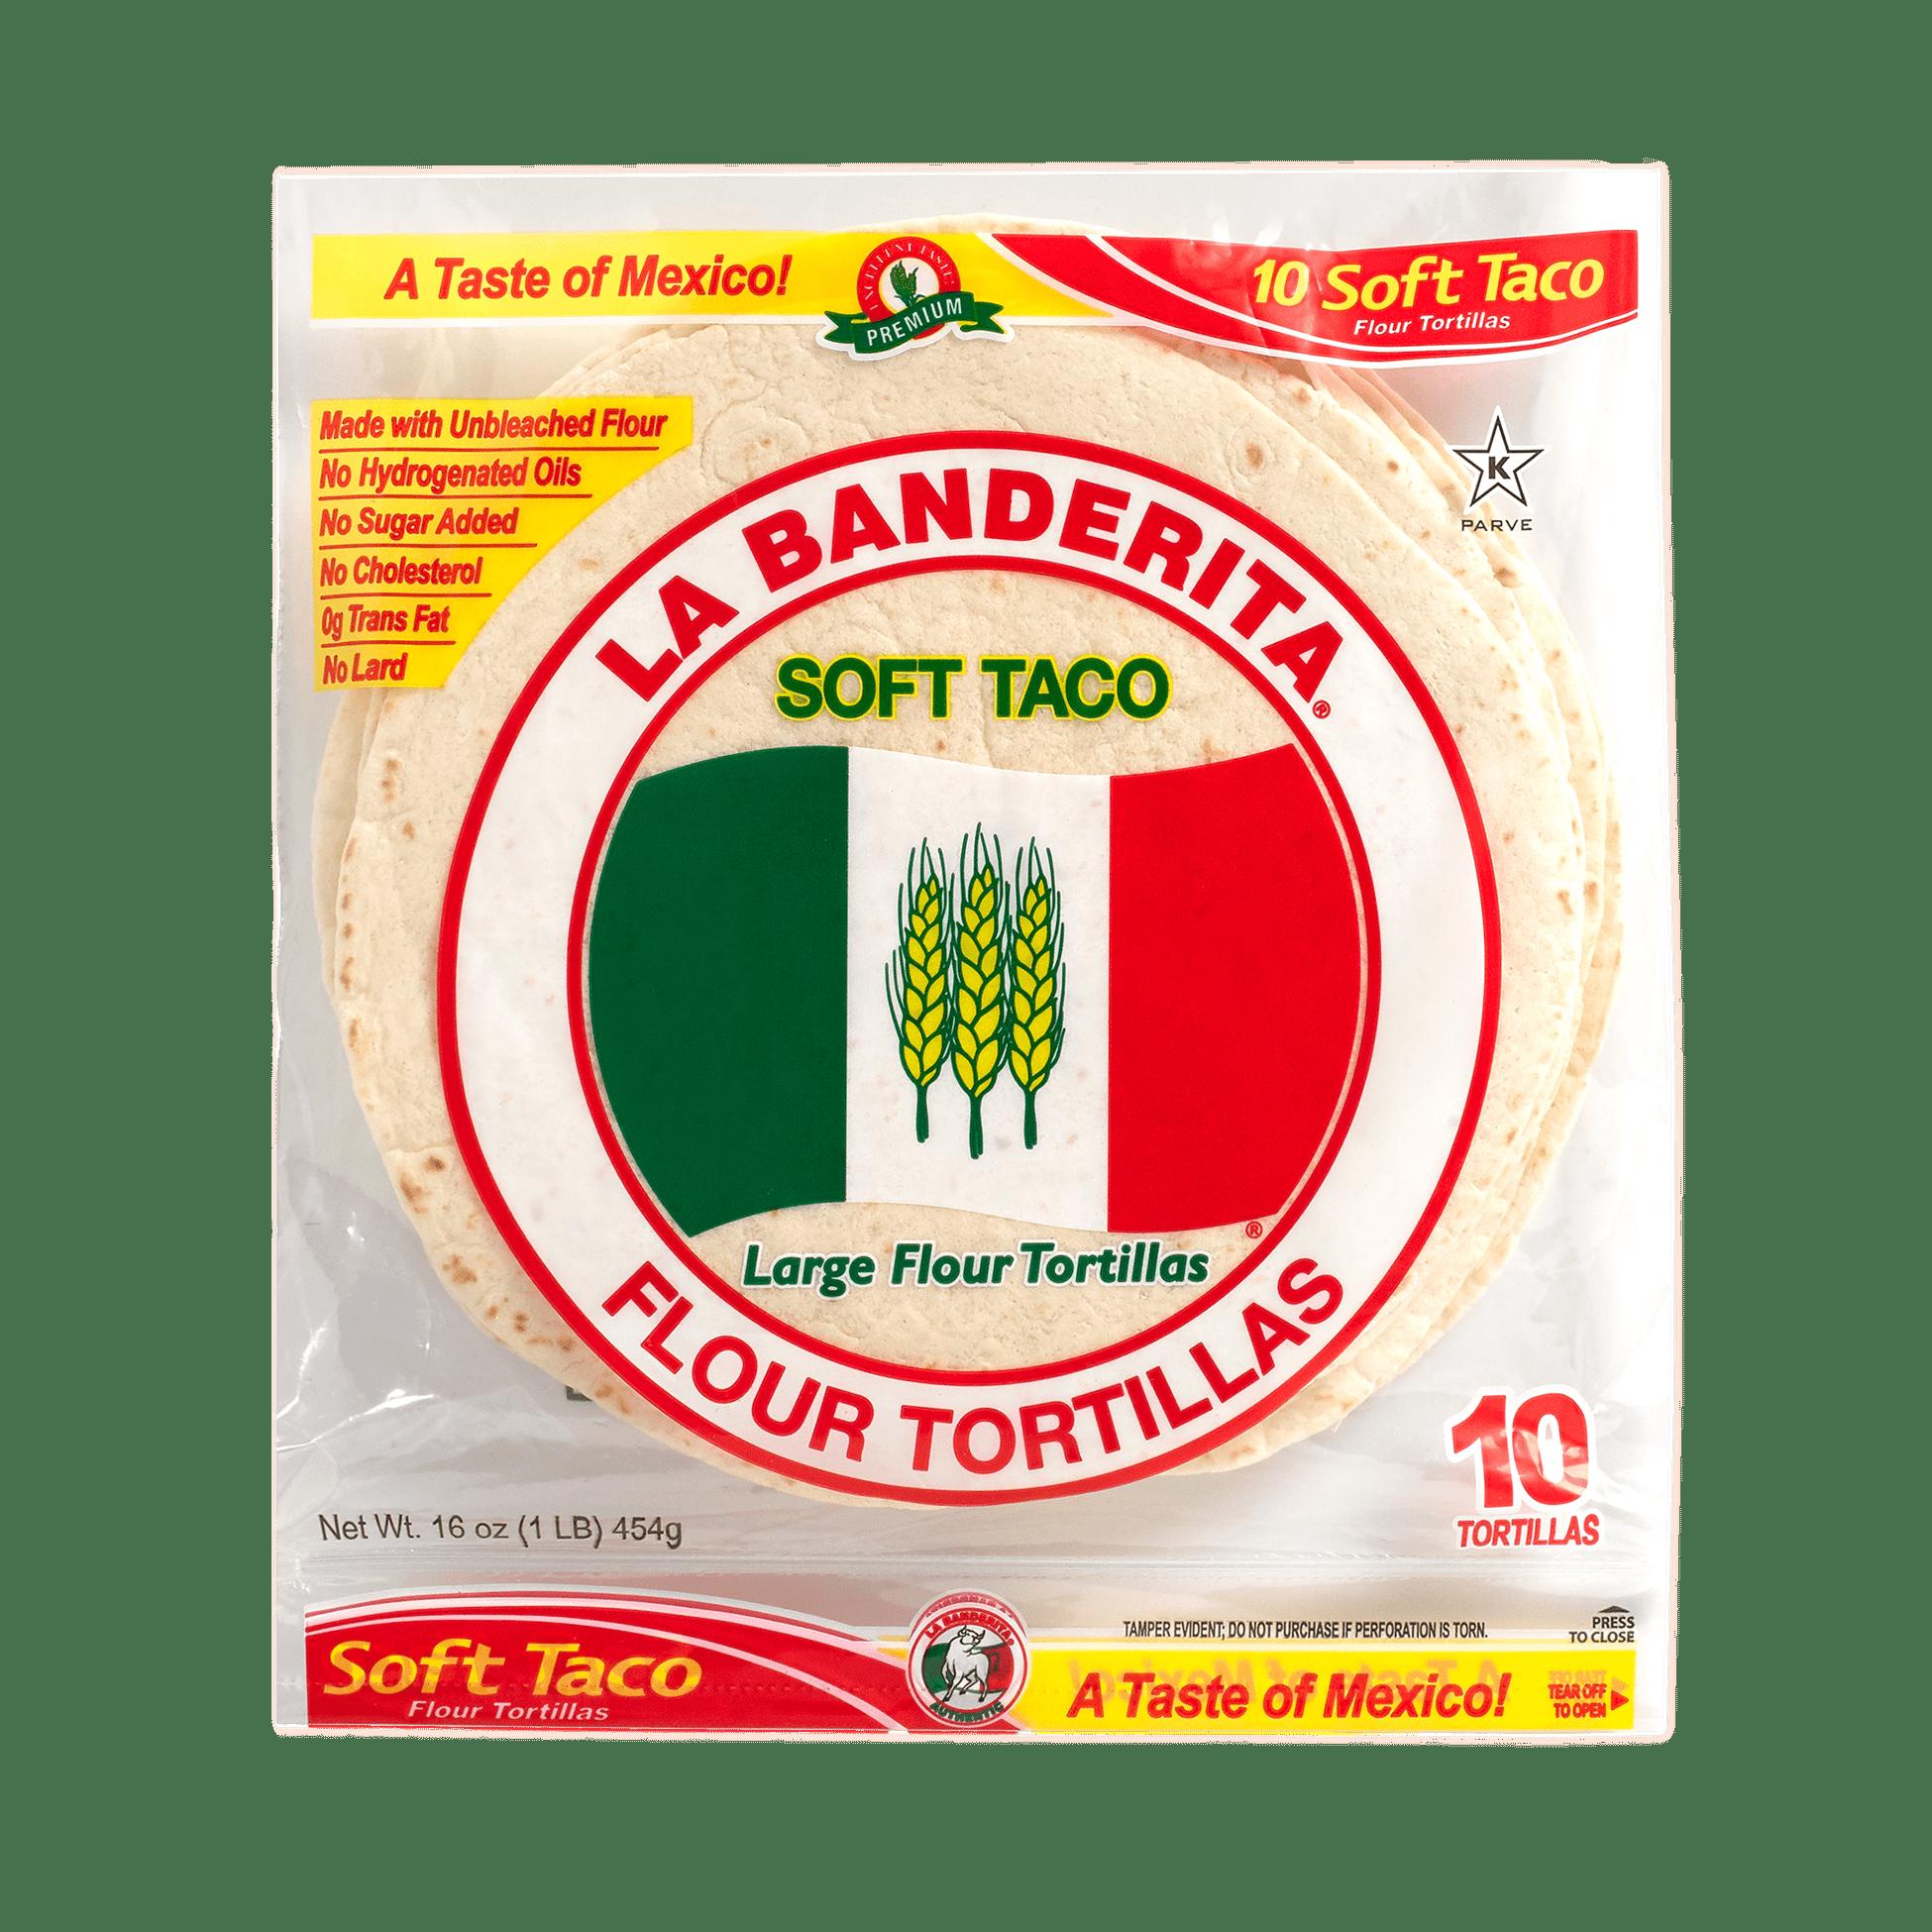 0110 - La Banderita Sort Taco - Front